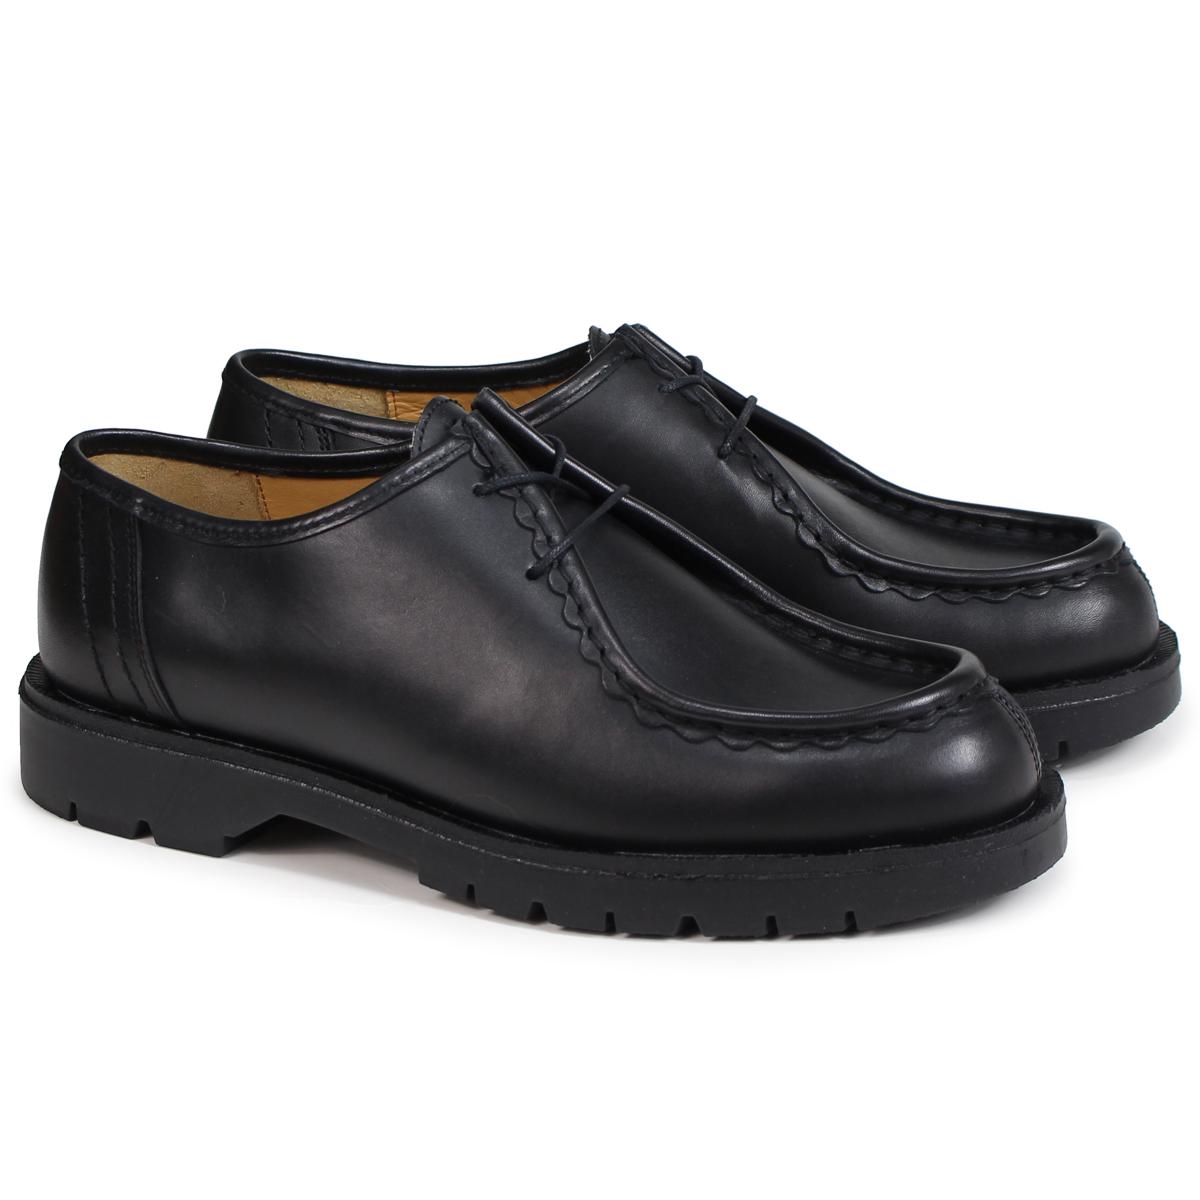 KLEMAN PADROR クレマン 靴 チロリアン シューズ メンズ TYROLEAN SHOES ブラック VA72102 [4/3 再入荷]